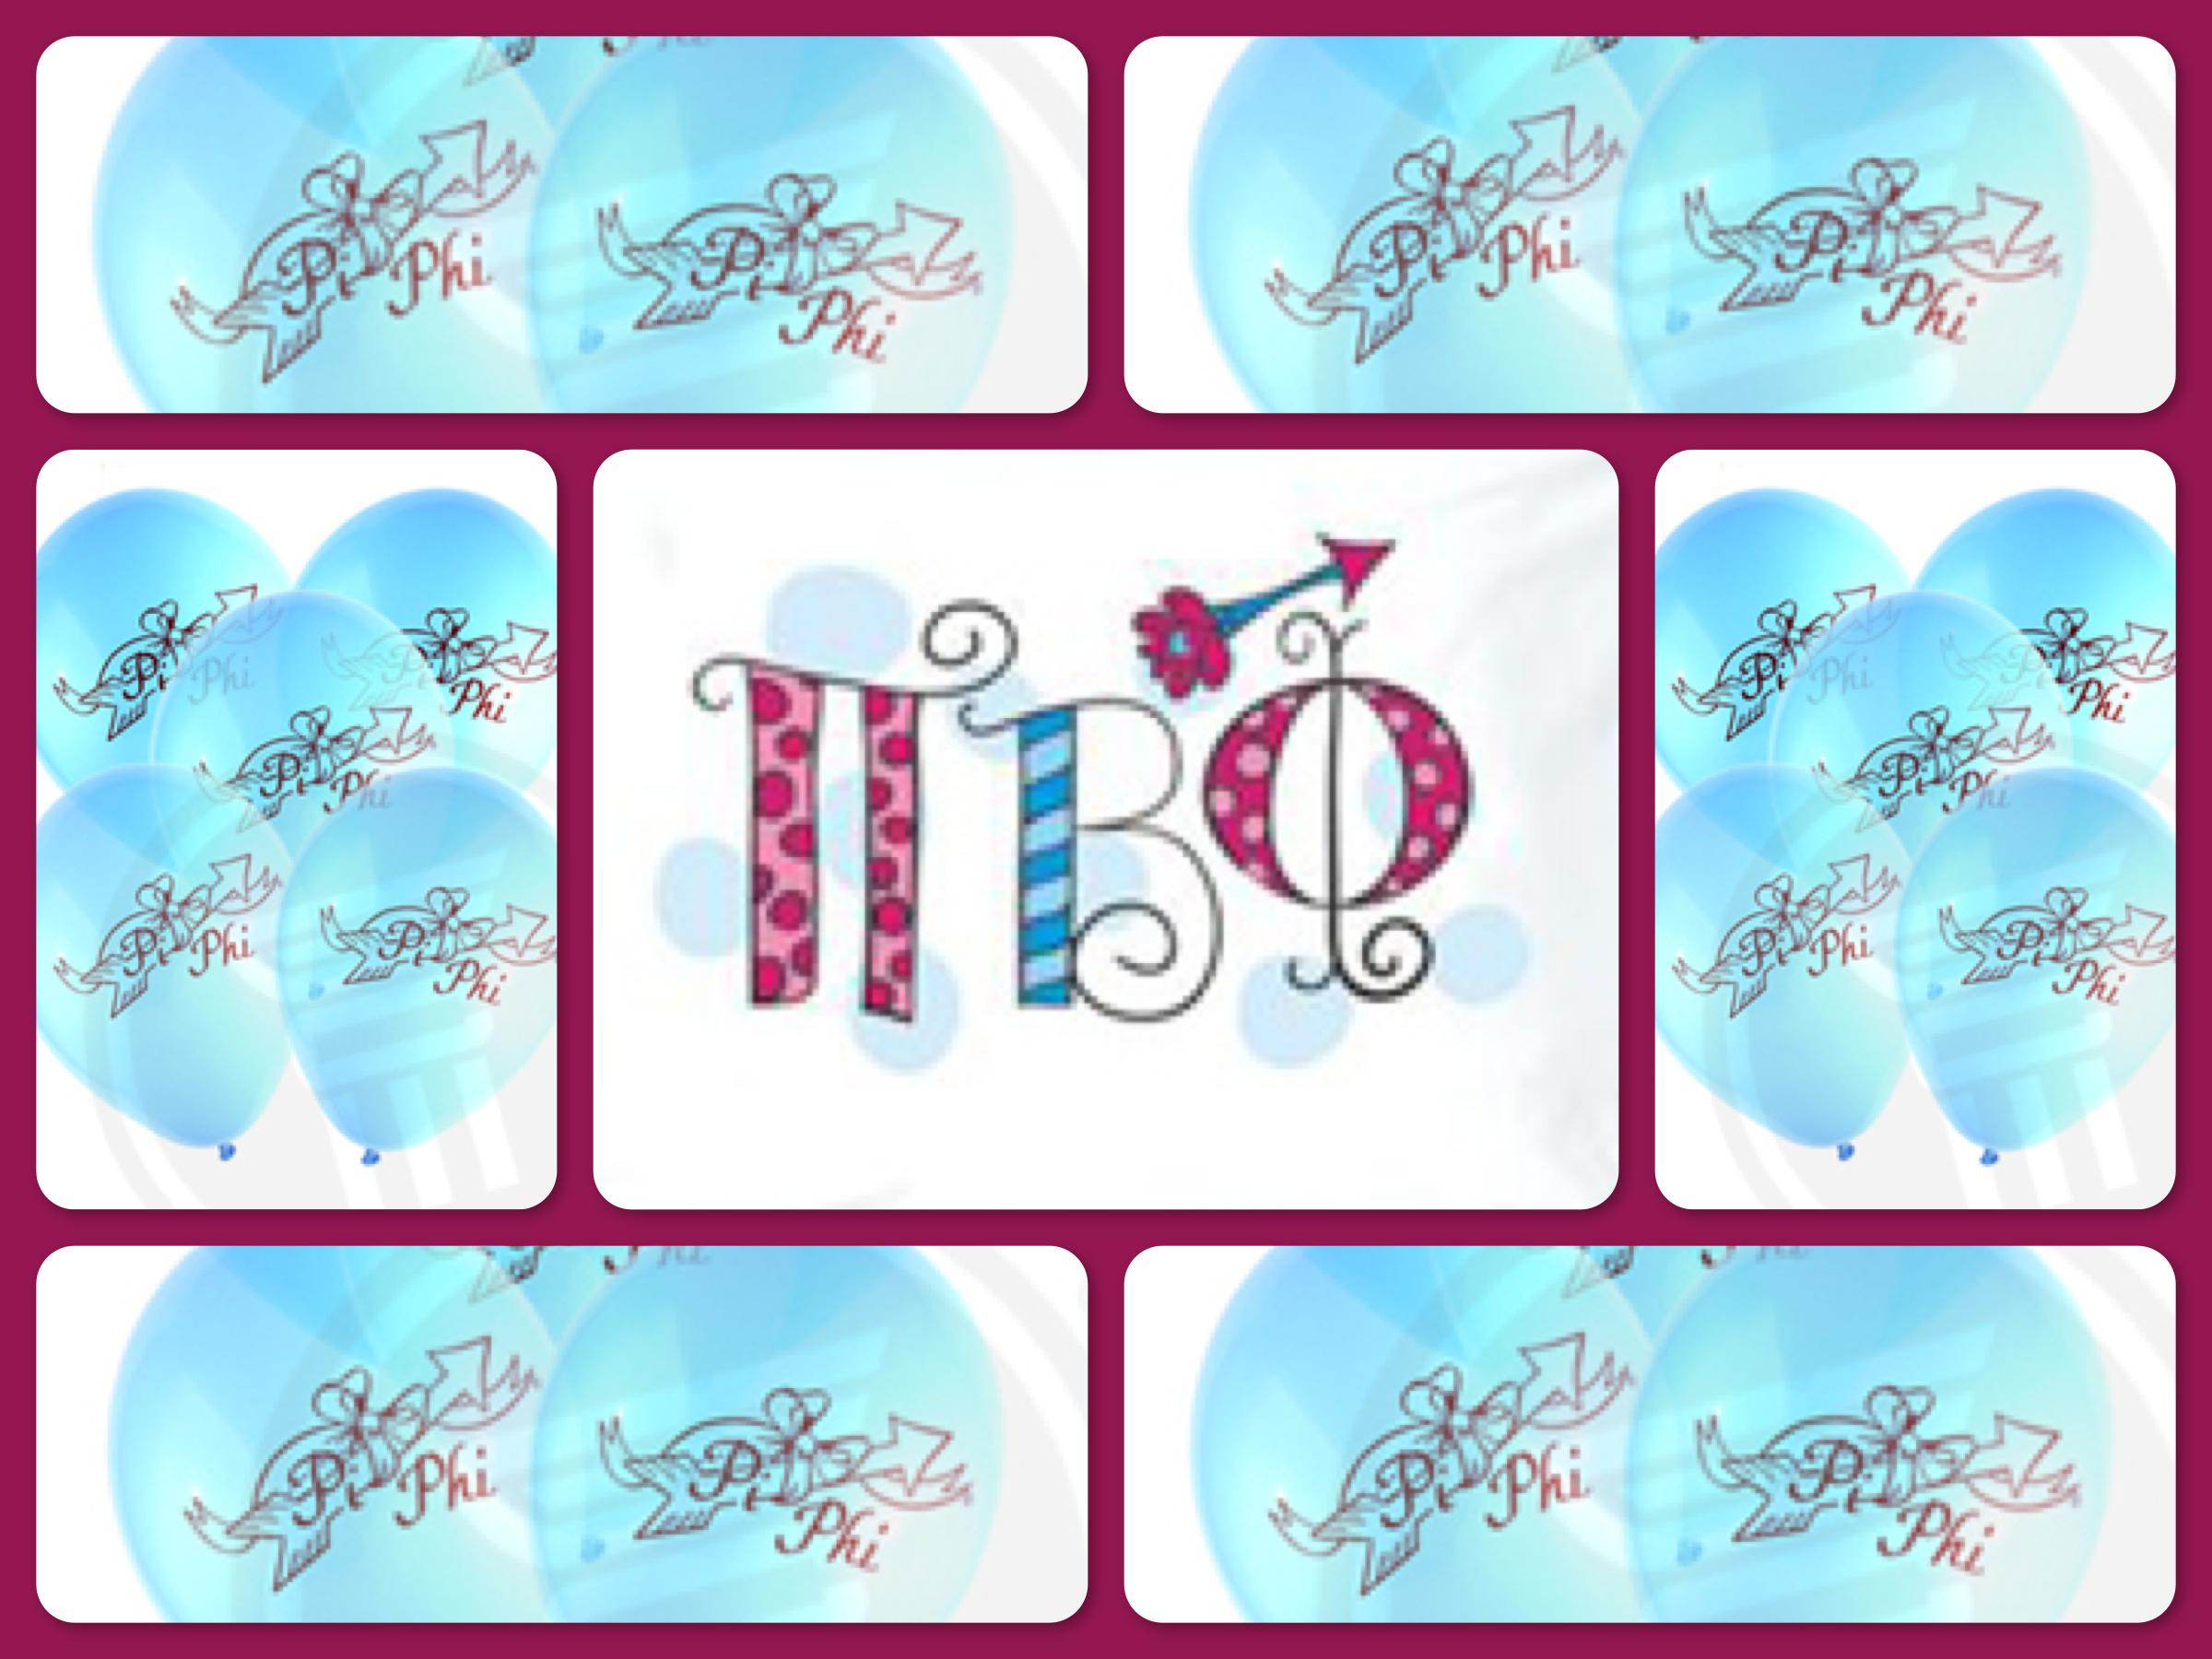 Celebrate Sisterhood - Best Pi Beta Phi Gifts